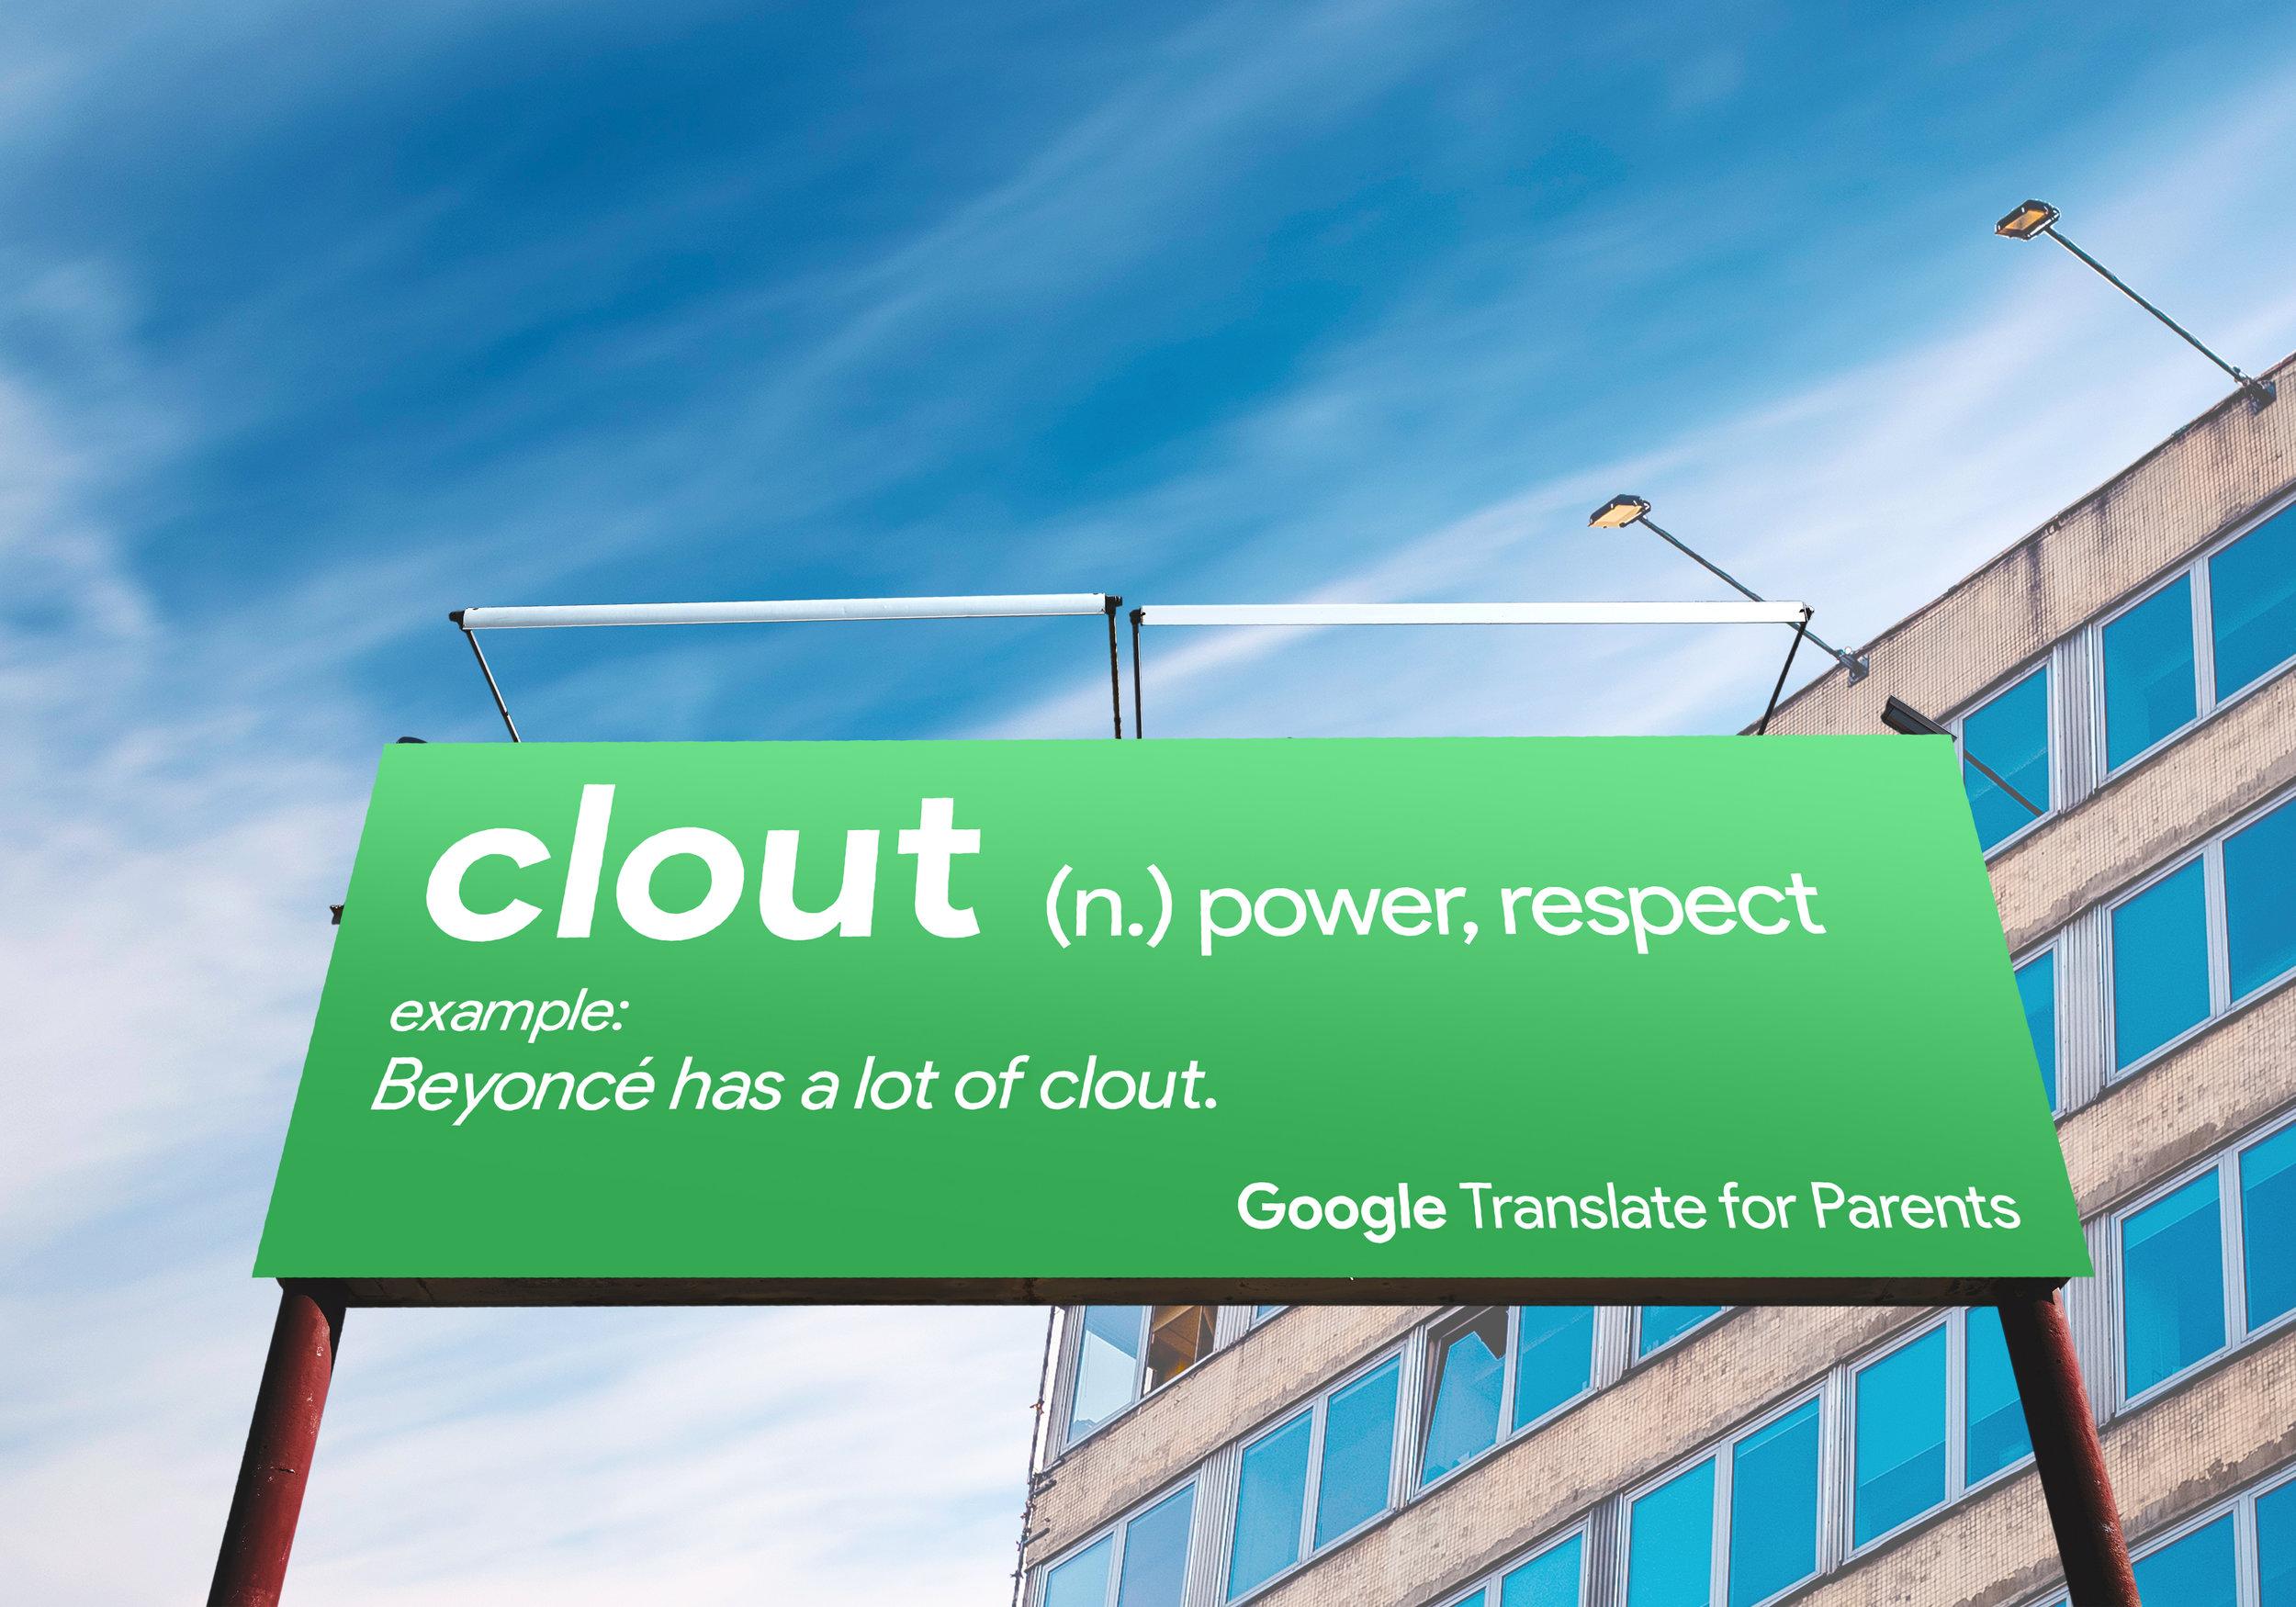 google billboard 4.jpg